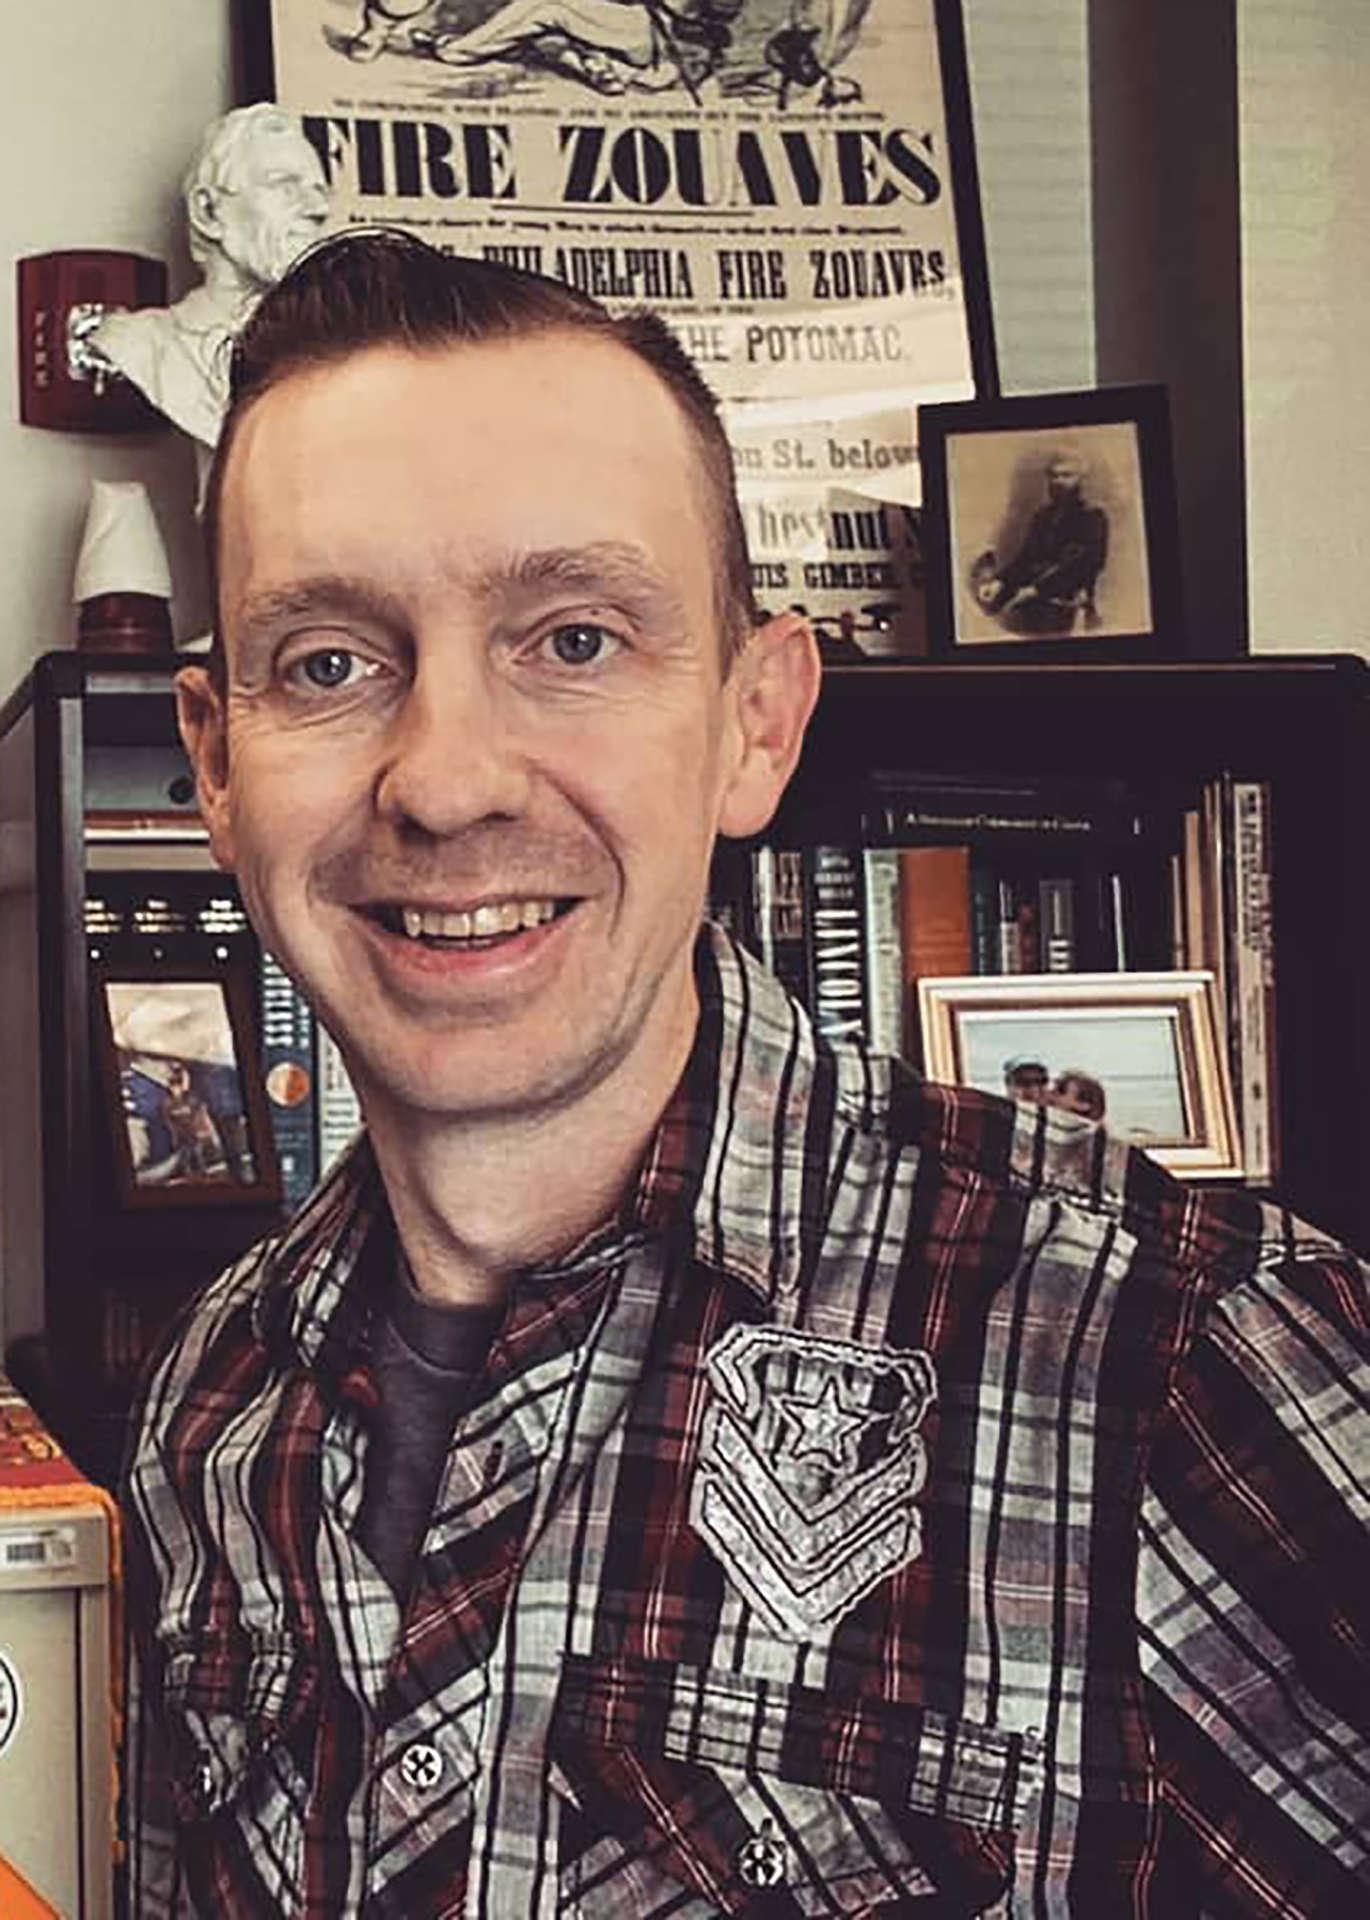 John Heckman, The Tattooed Historian